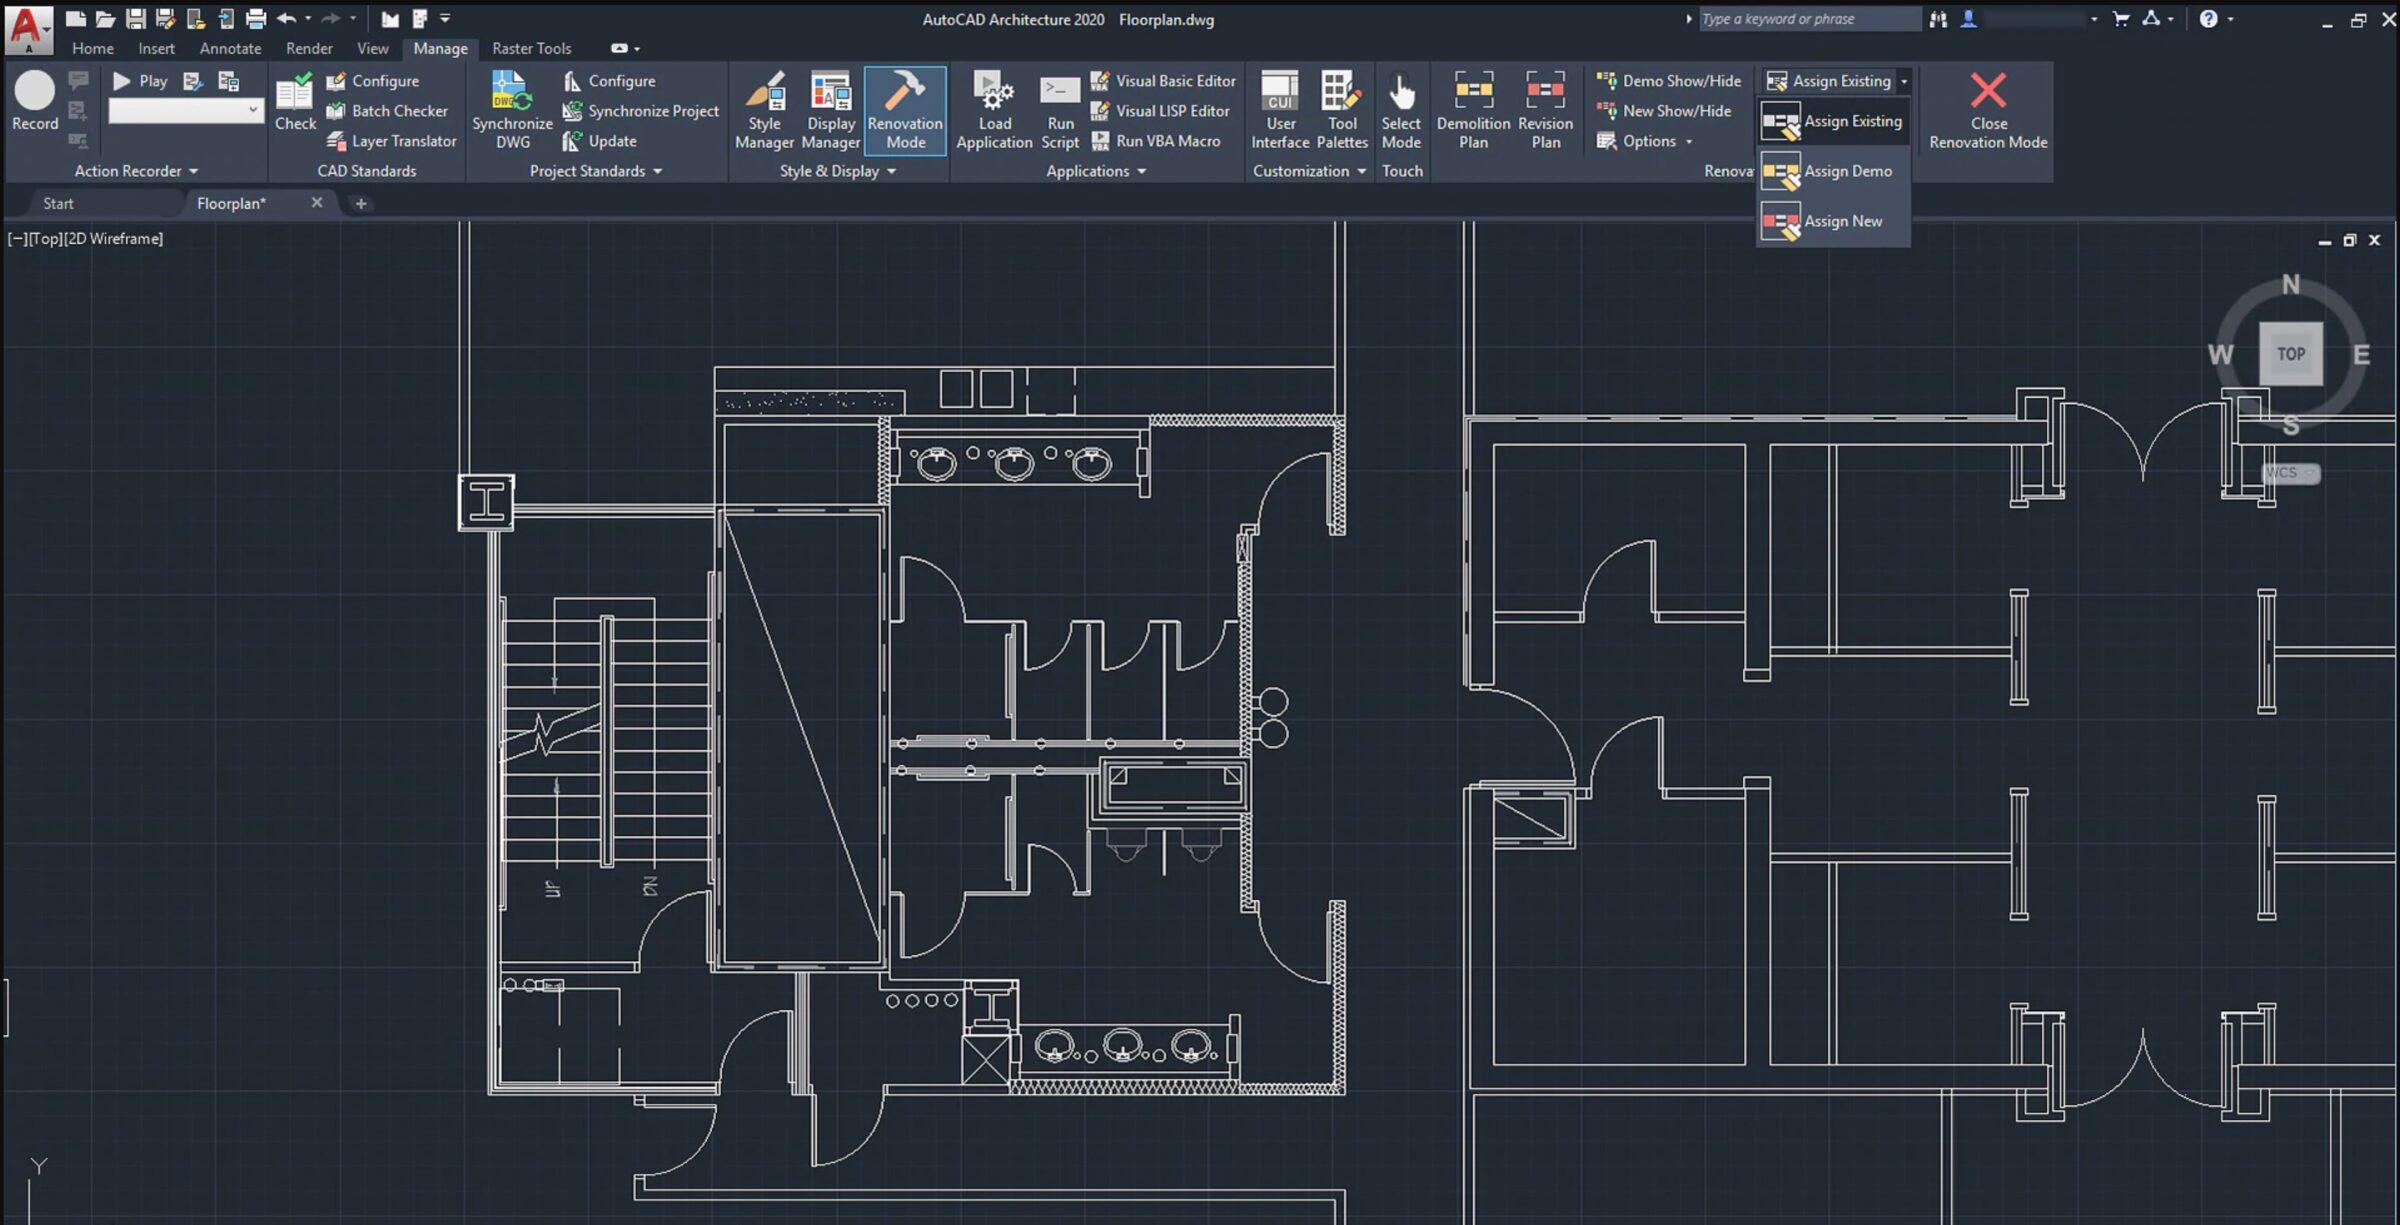 house plans software   Stacbond